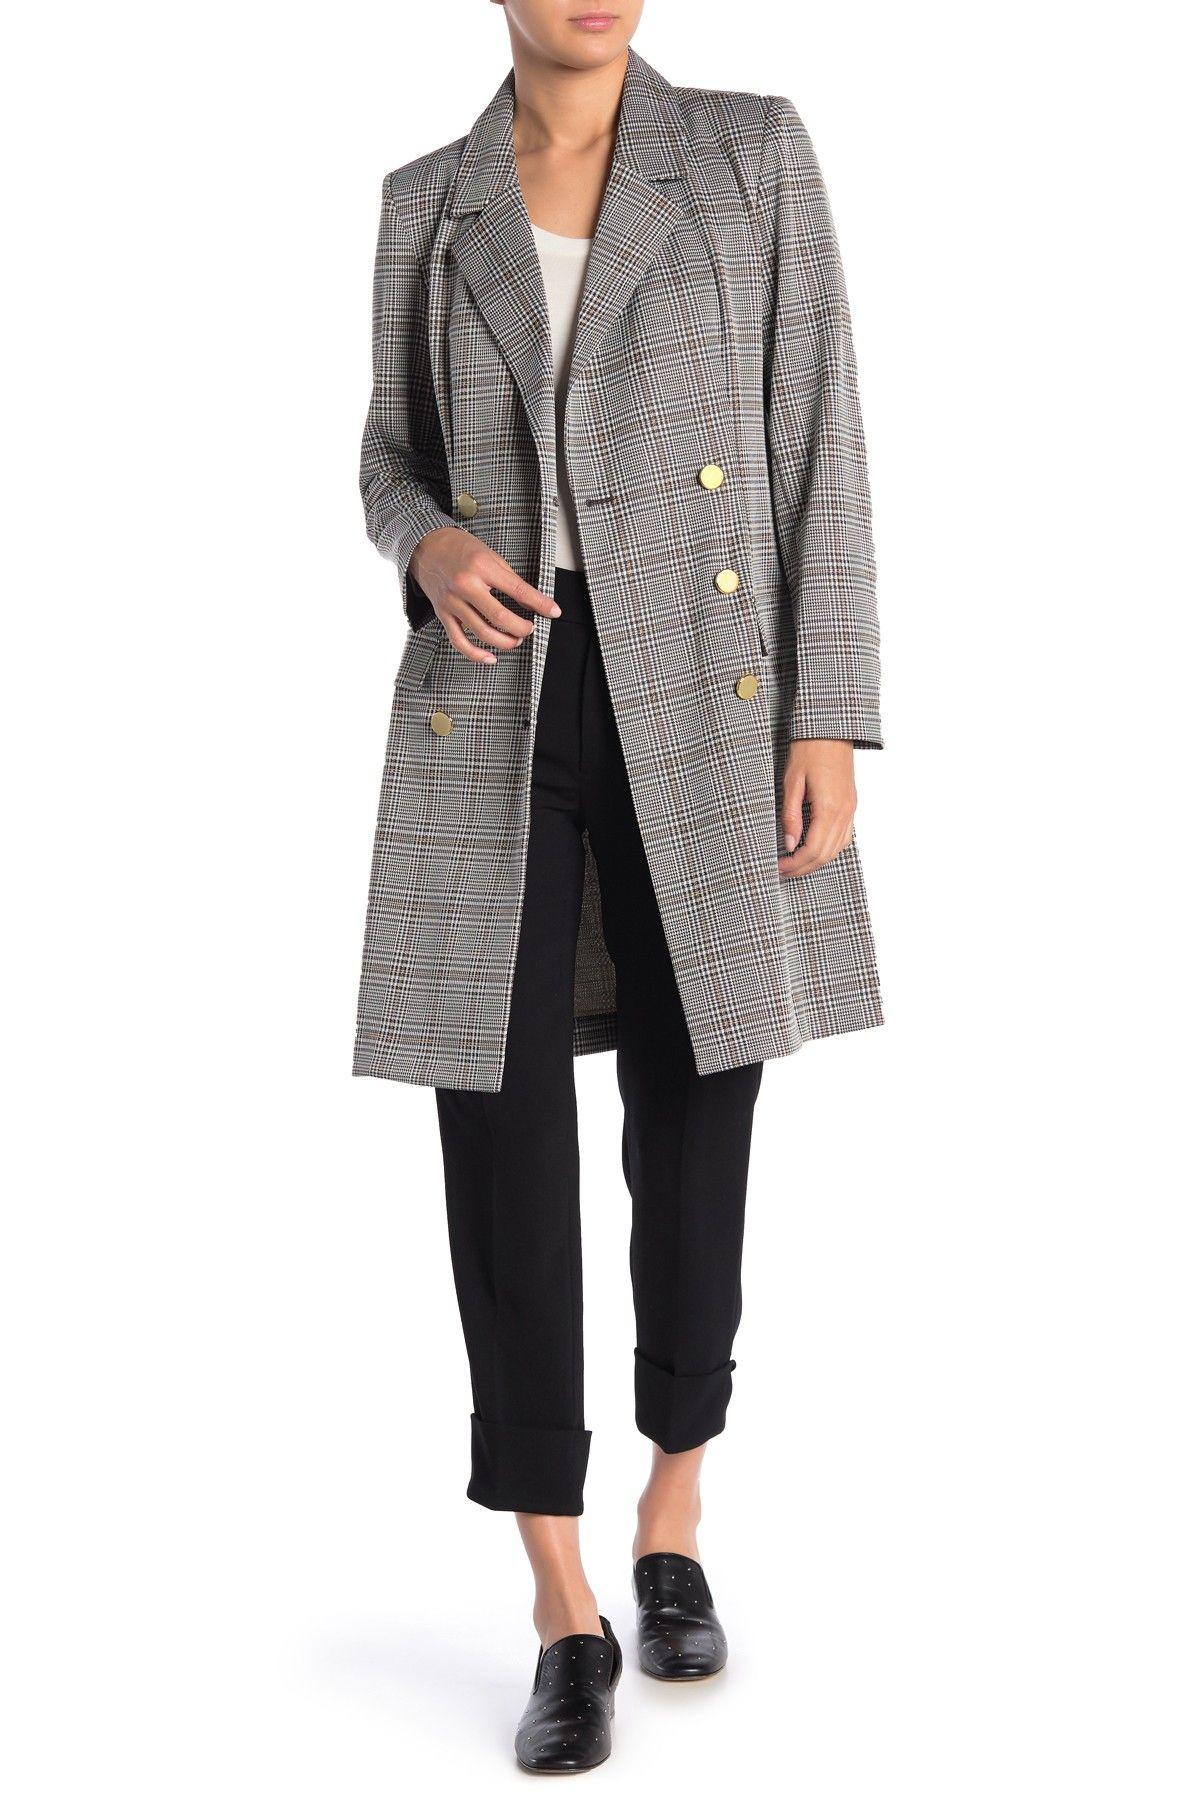 Nanette Lepore | Plaid Double Breasted Coat #nordstromrack